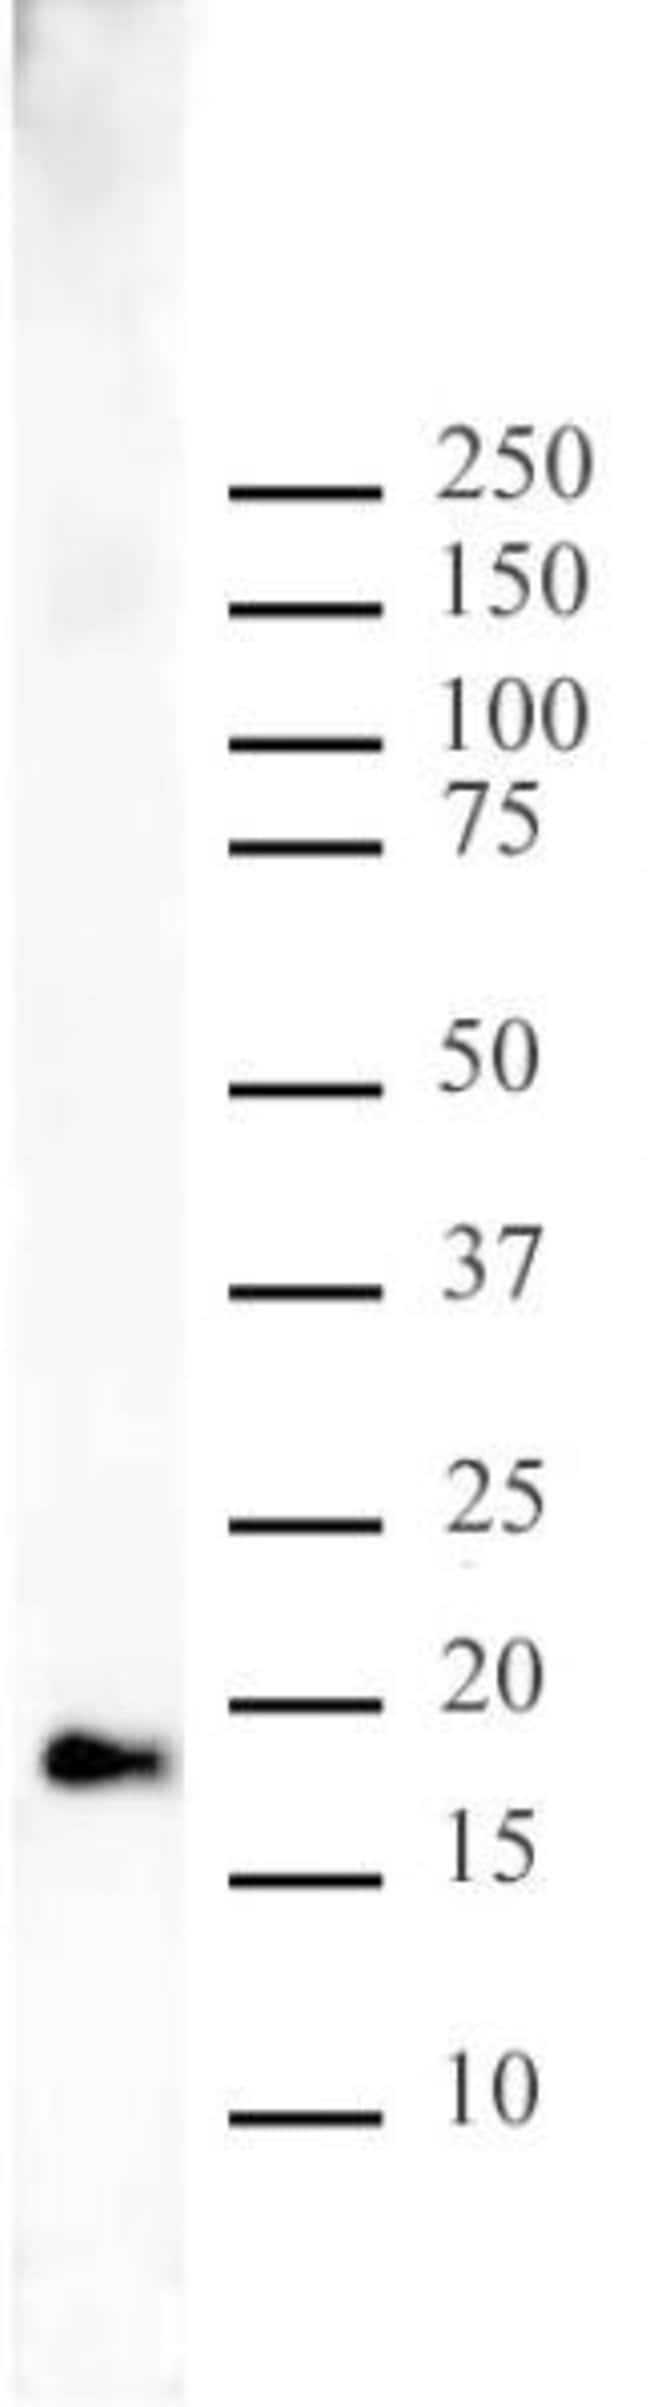 Histone H3K9me1 Rabbit anti-Human, Unconjugated, Polyclonal, Active Motif:Antibodies:Primary